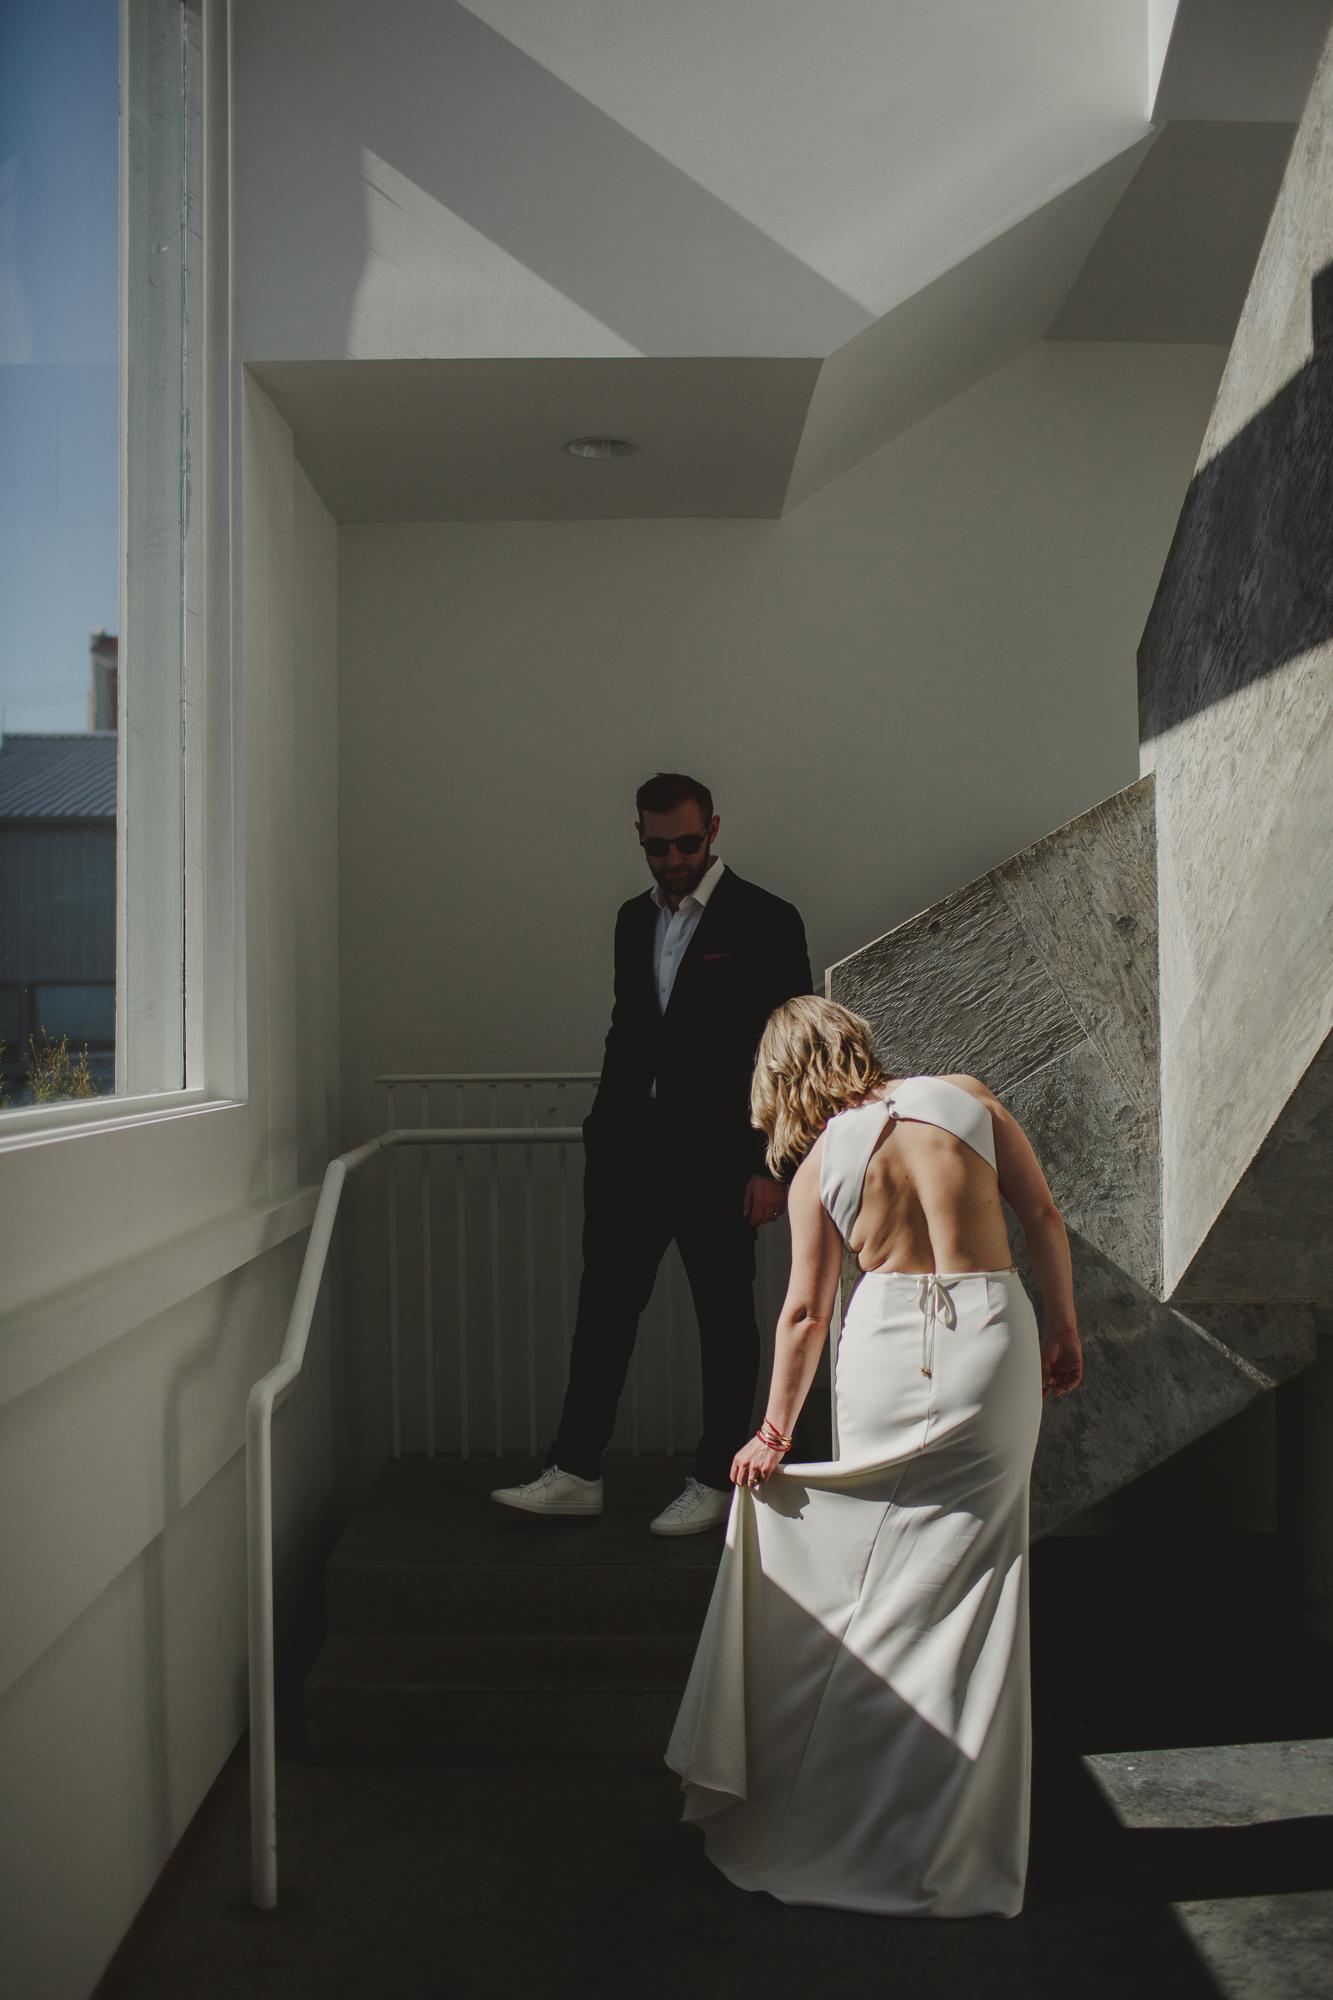 canvas event space wedding photos by Krista Welch-0033.jpg